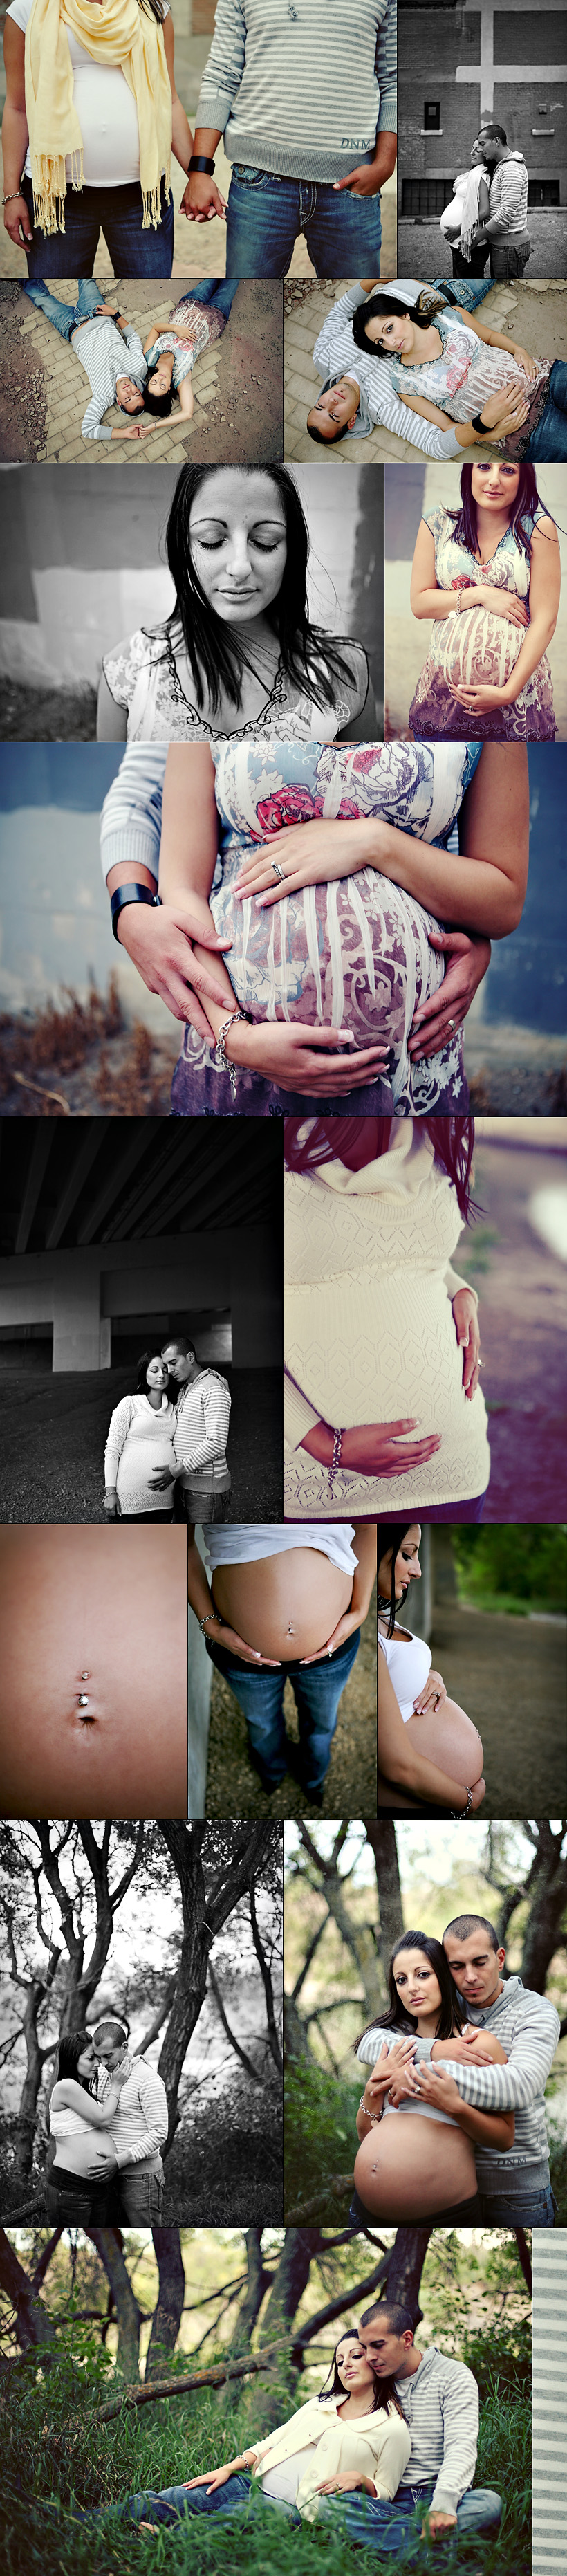 edmonton maternity photographer